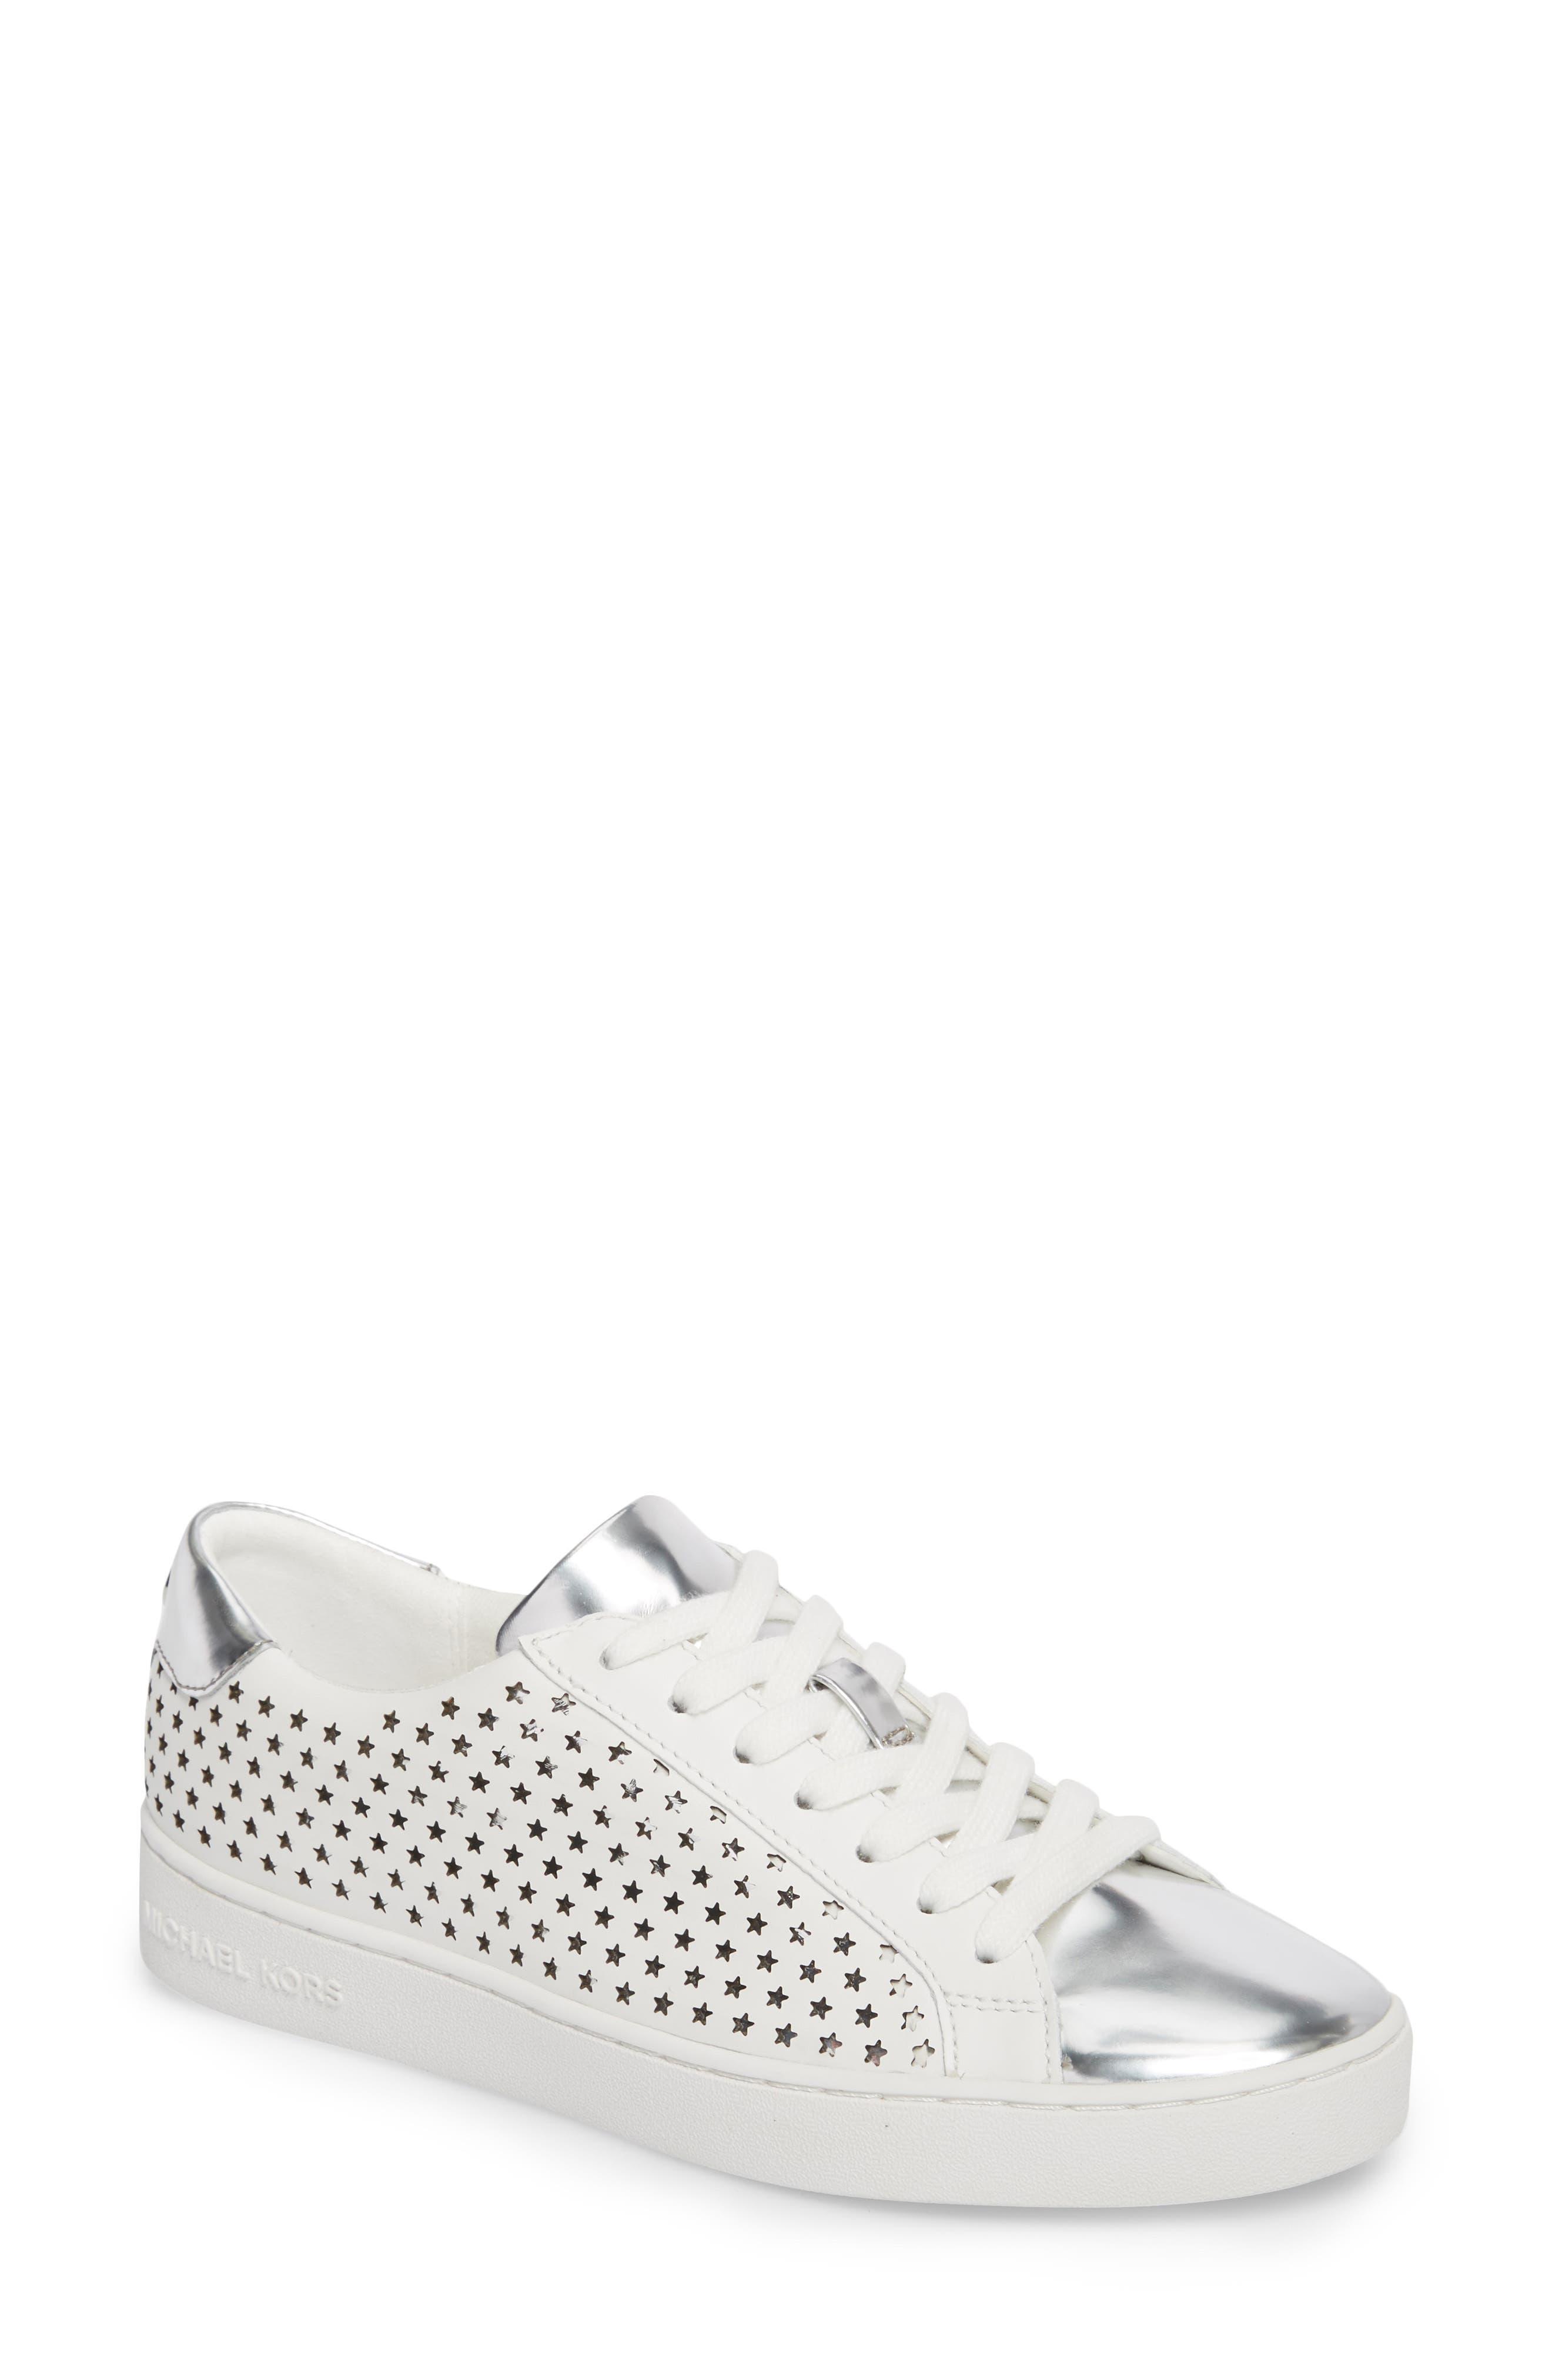 Irving Sneaker,                         Main,                         color, Optic White